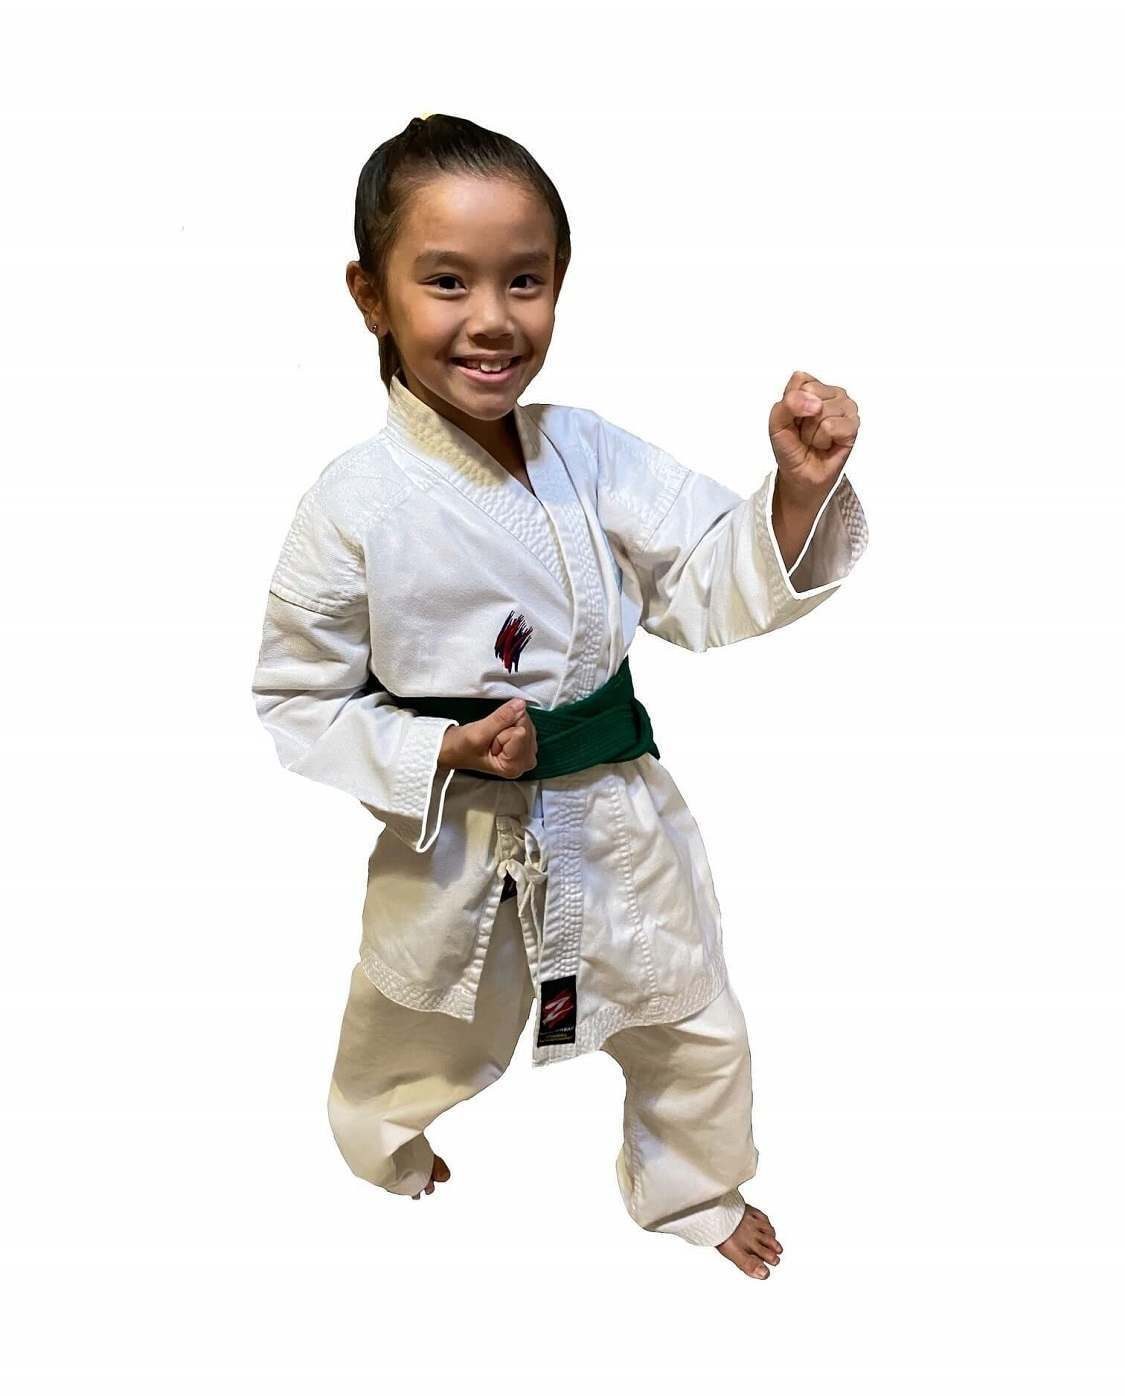 Webp.net Resizeimage, Excel Taekwondo Littleton CO